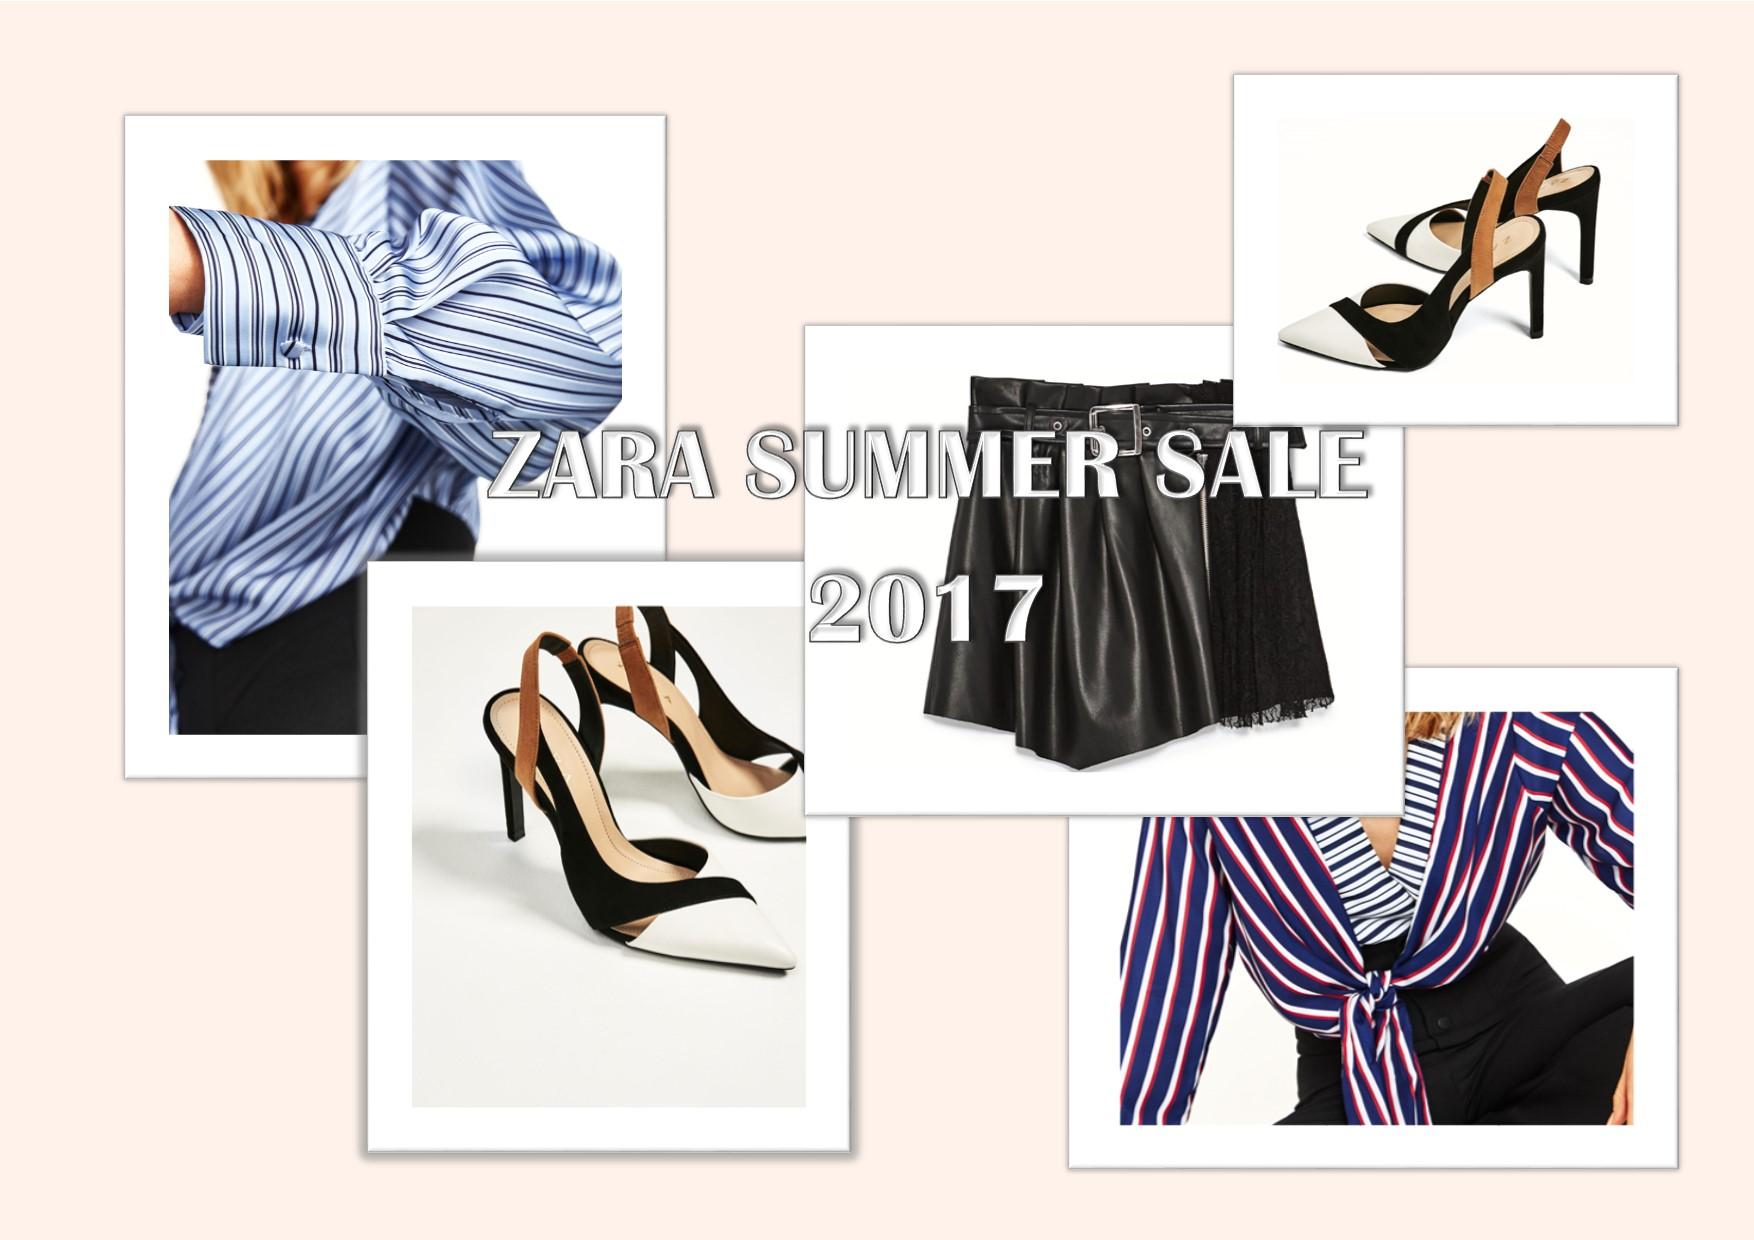 ZARA SUMMER SALE / MY TOP 6 PICKS